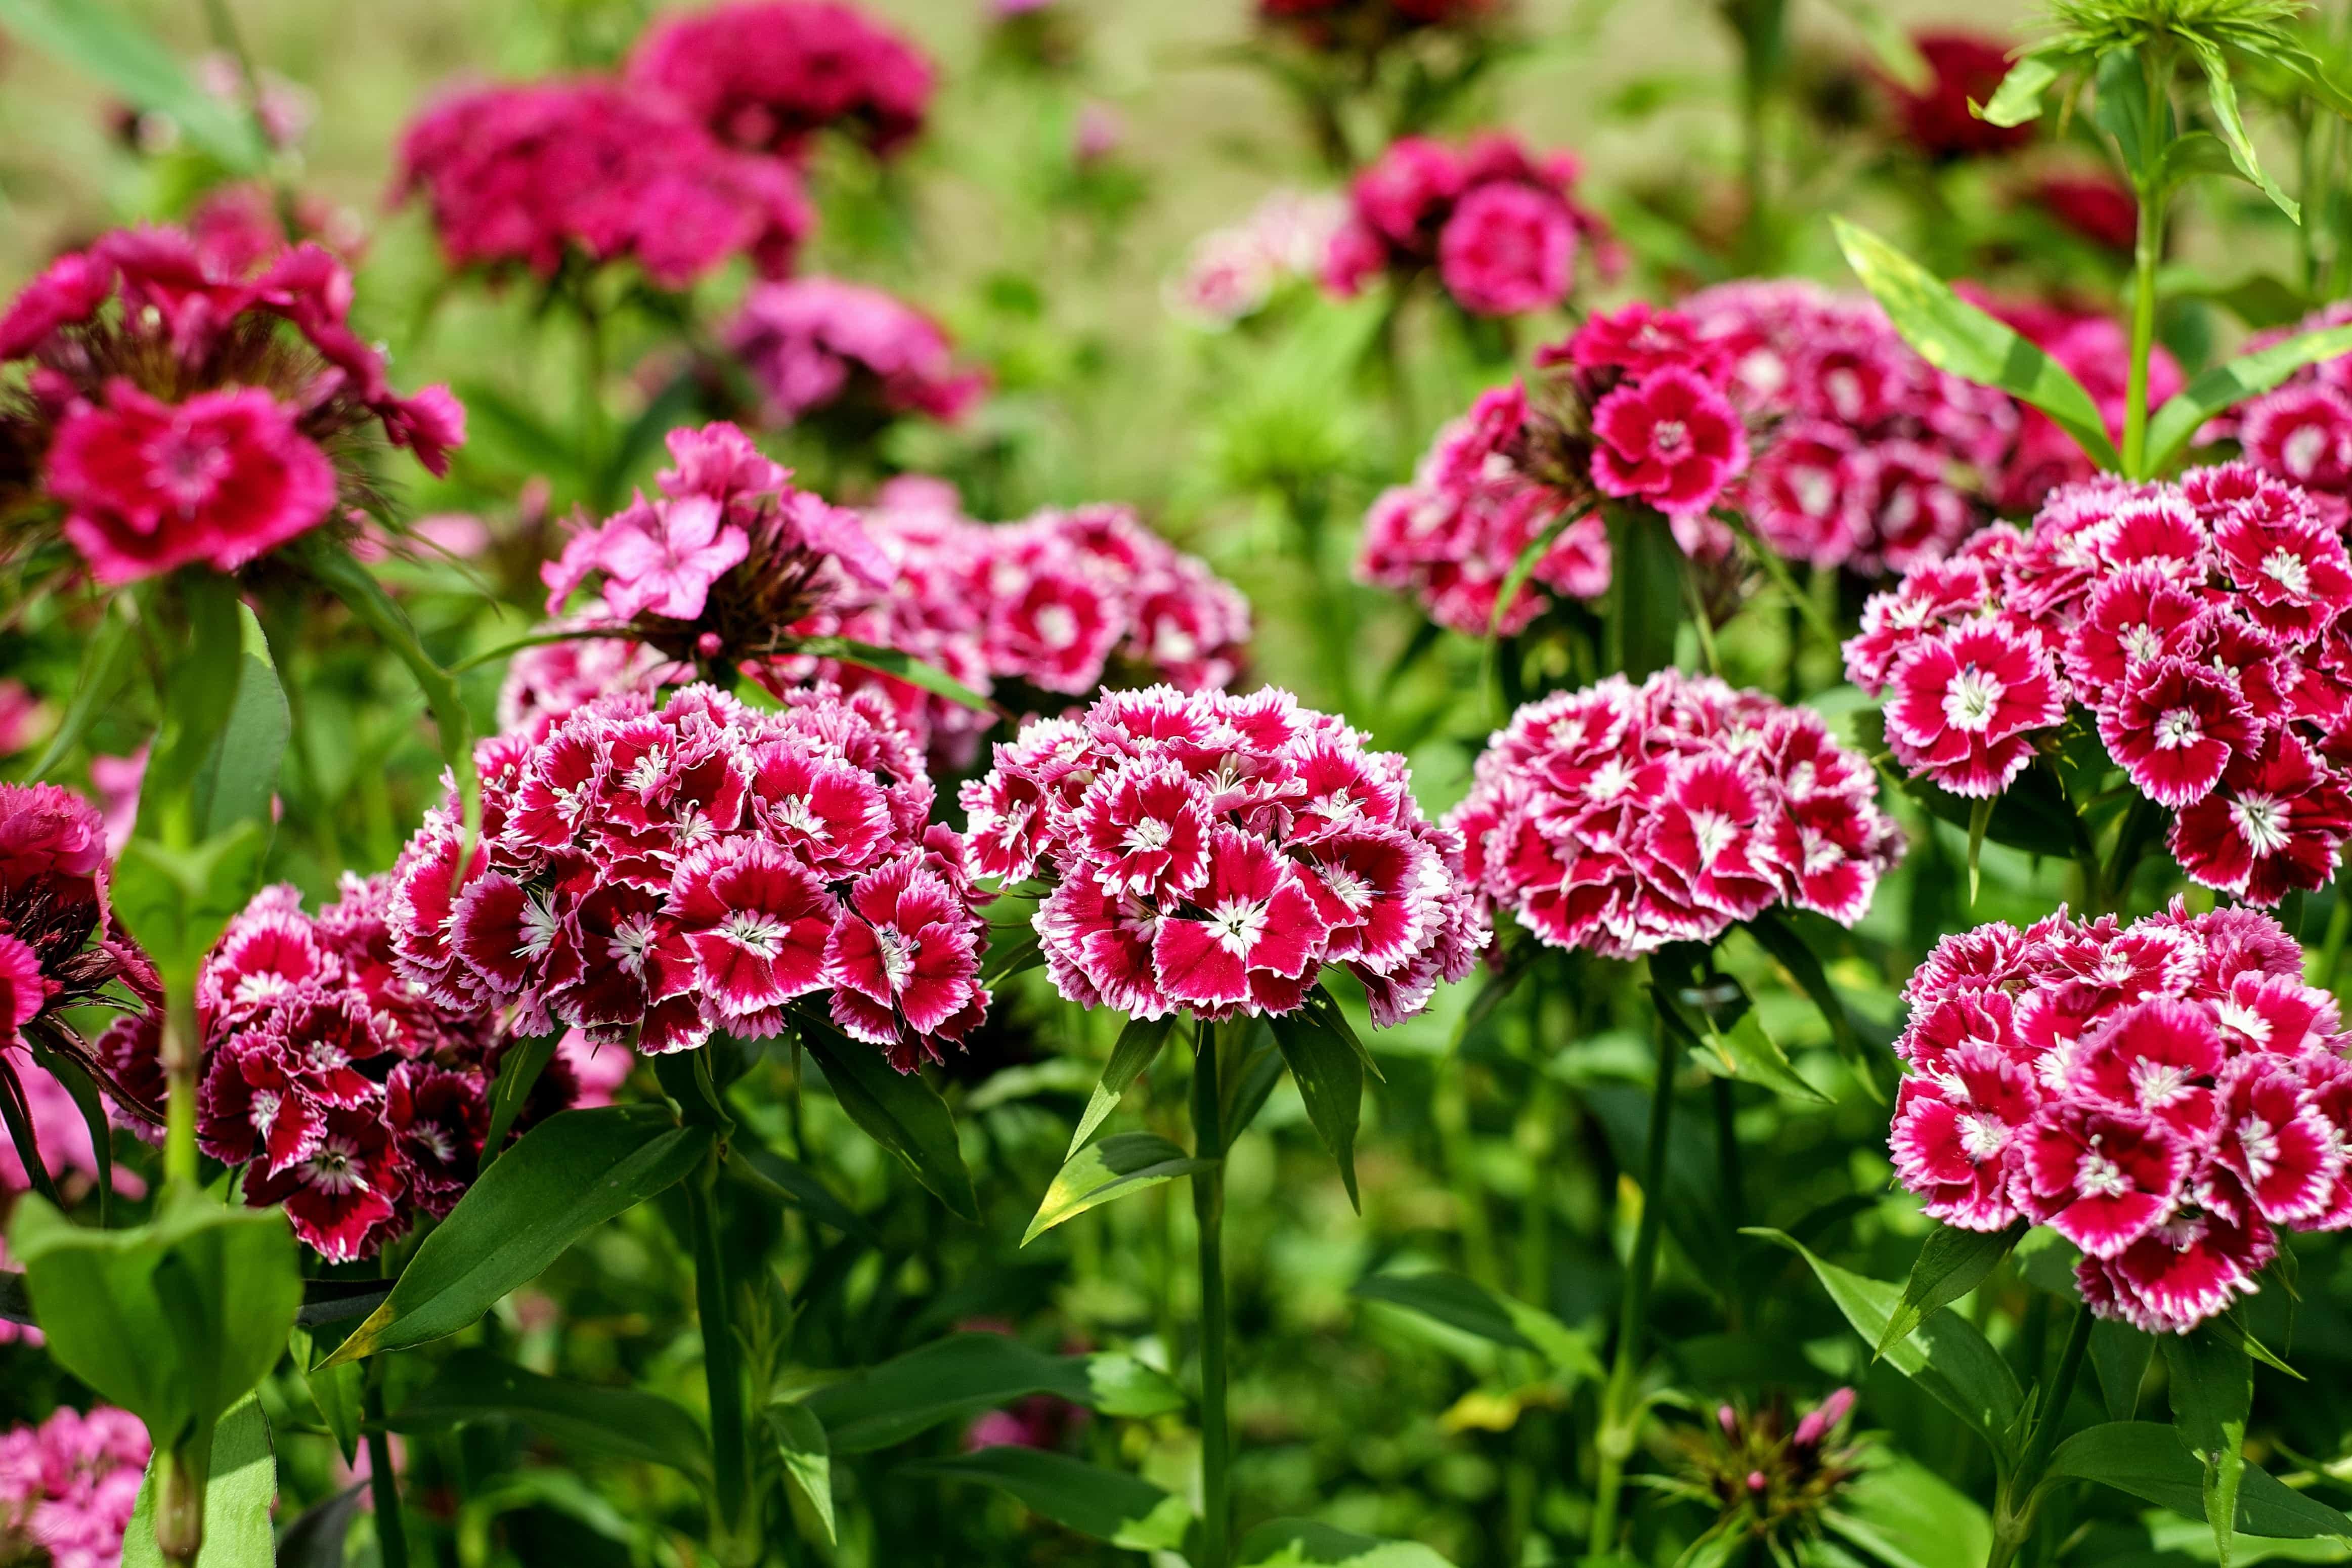 kostenlose bild nelke flora blumen sommer bl tenblatt garten natur rasen. Black Bedroom Furniture Sets. Home Design Ideas